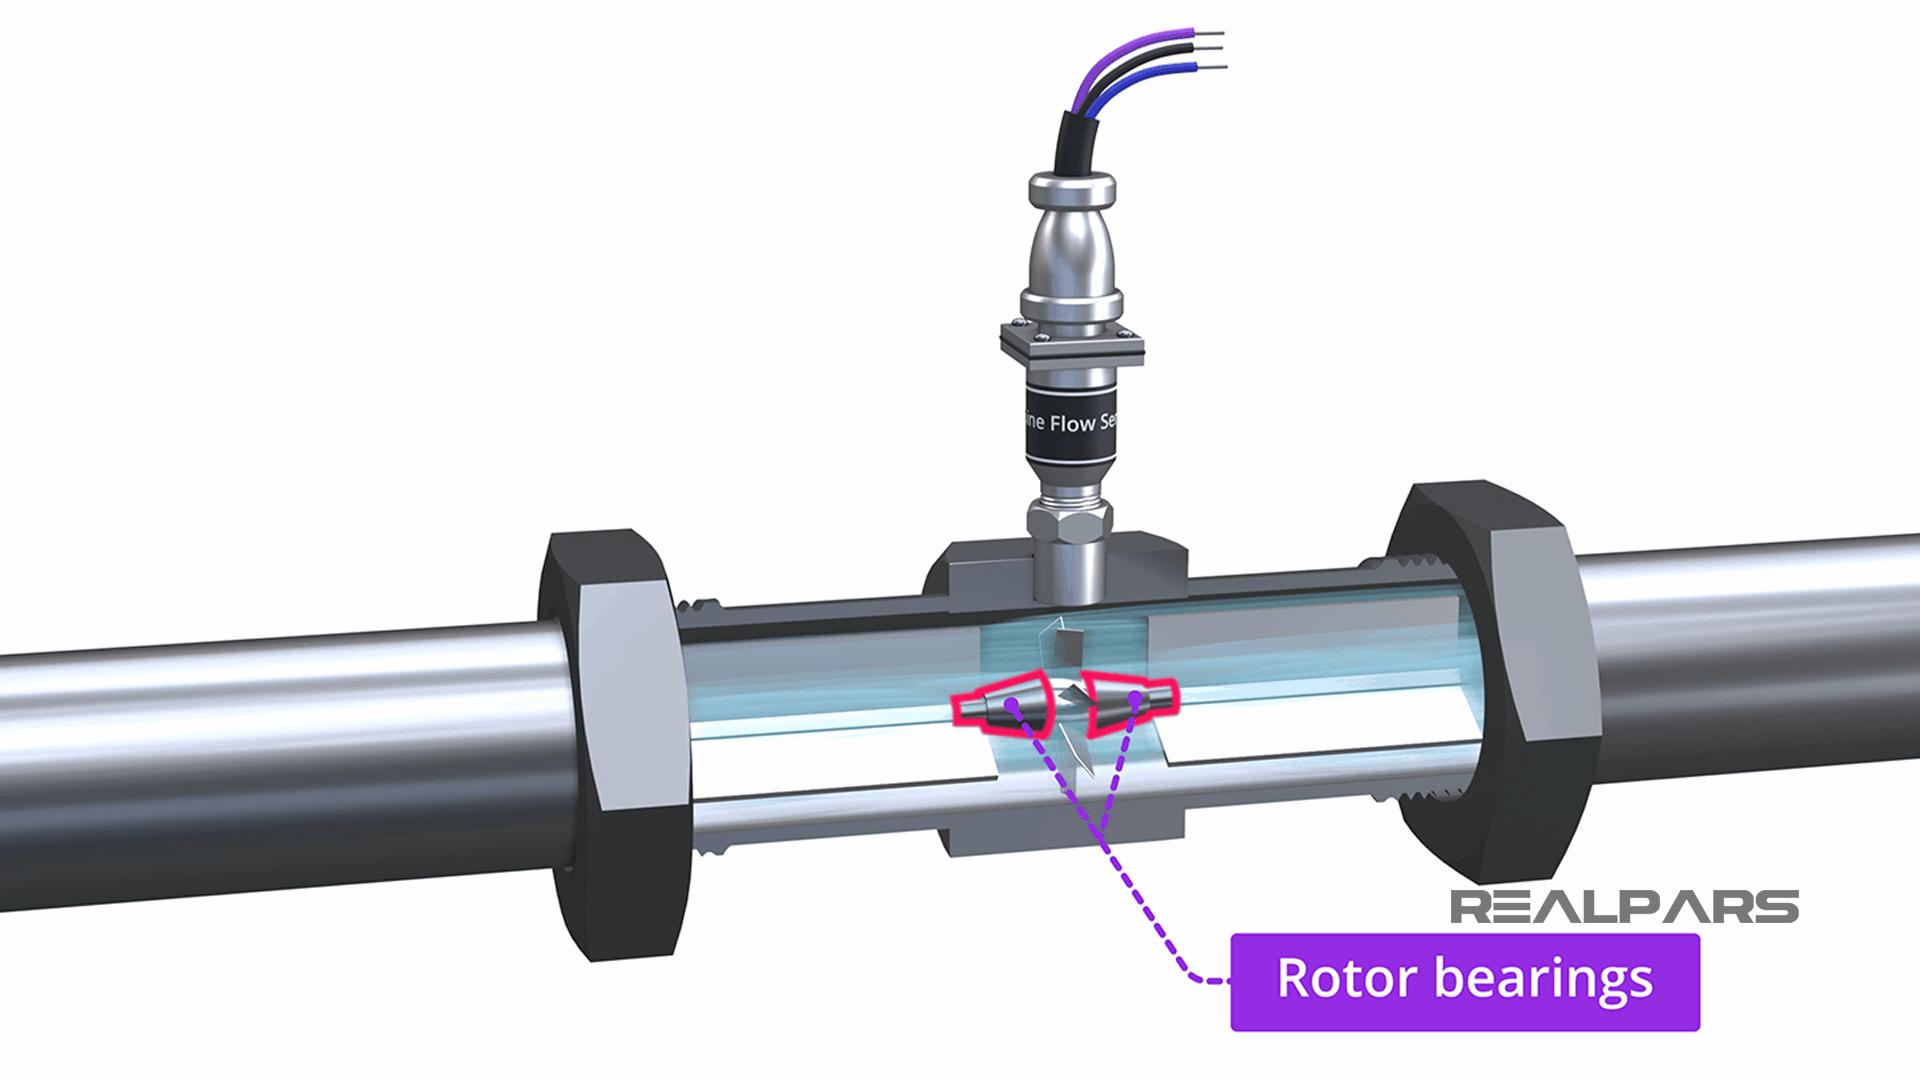 Flow meter limitations